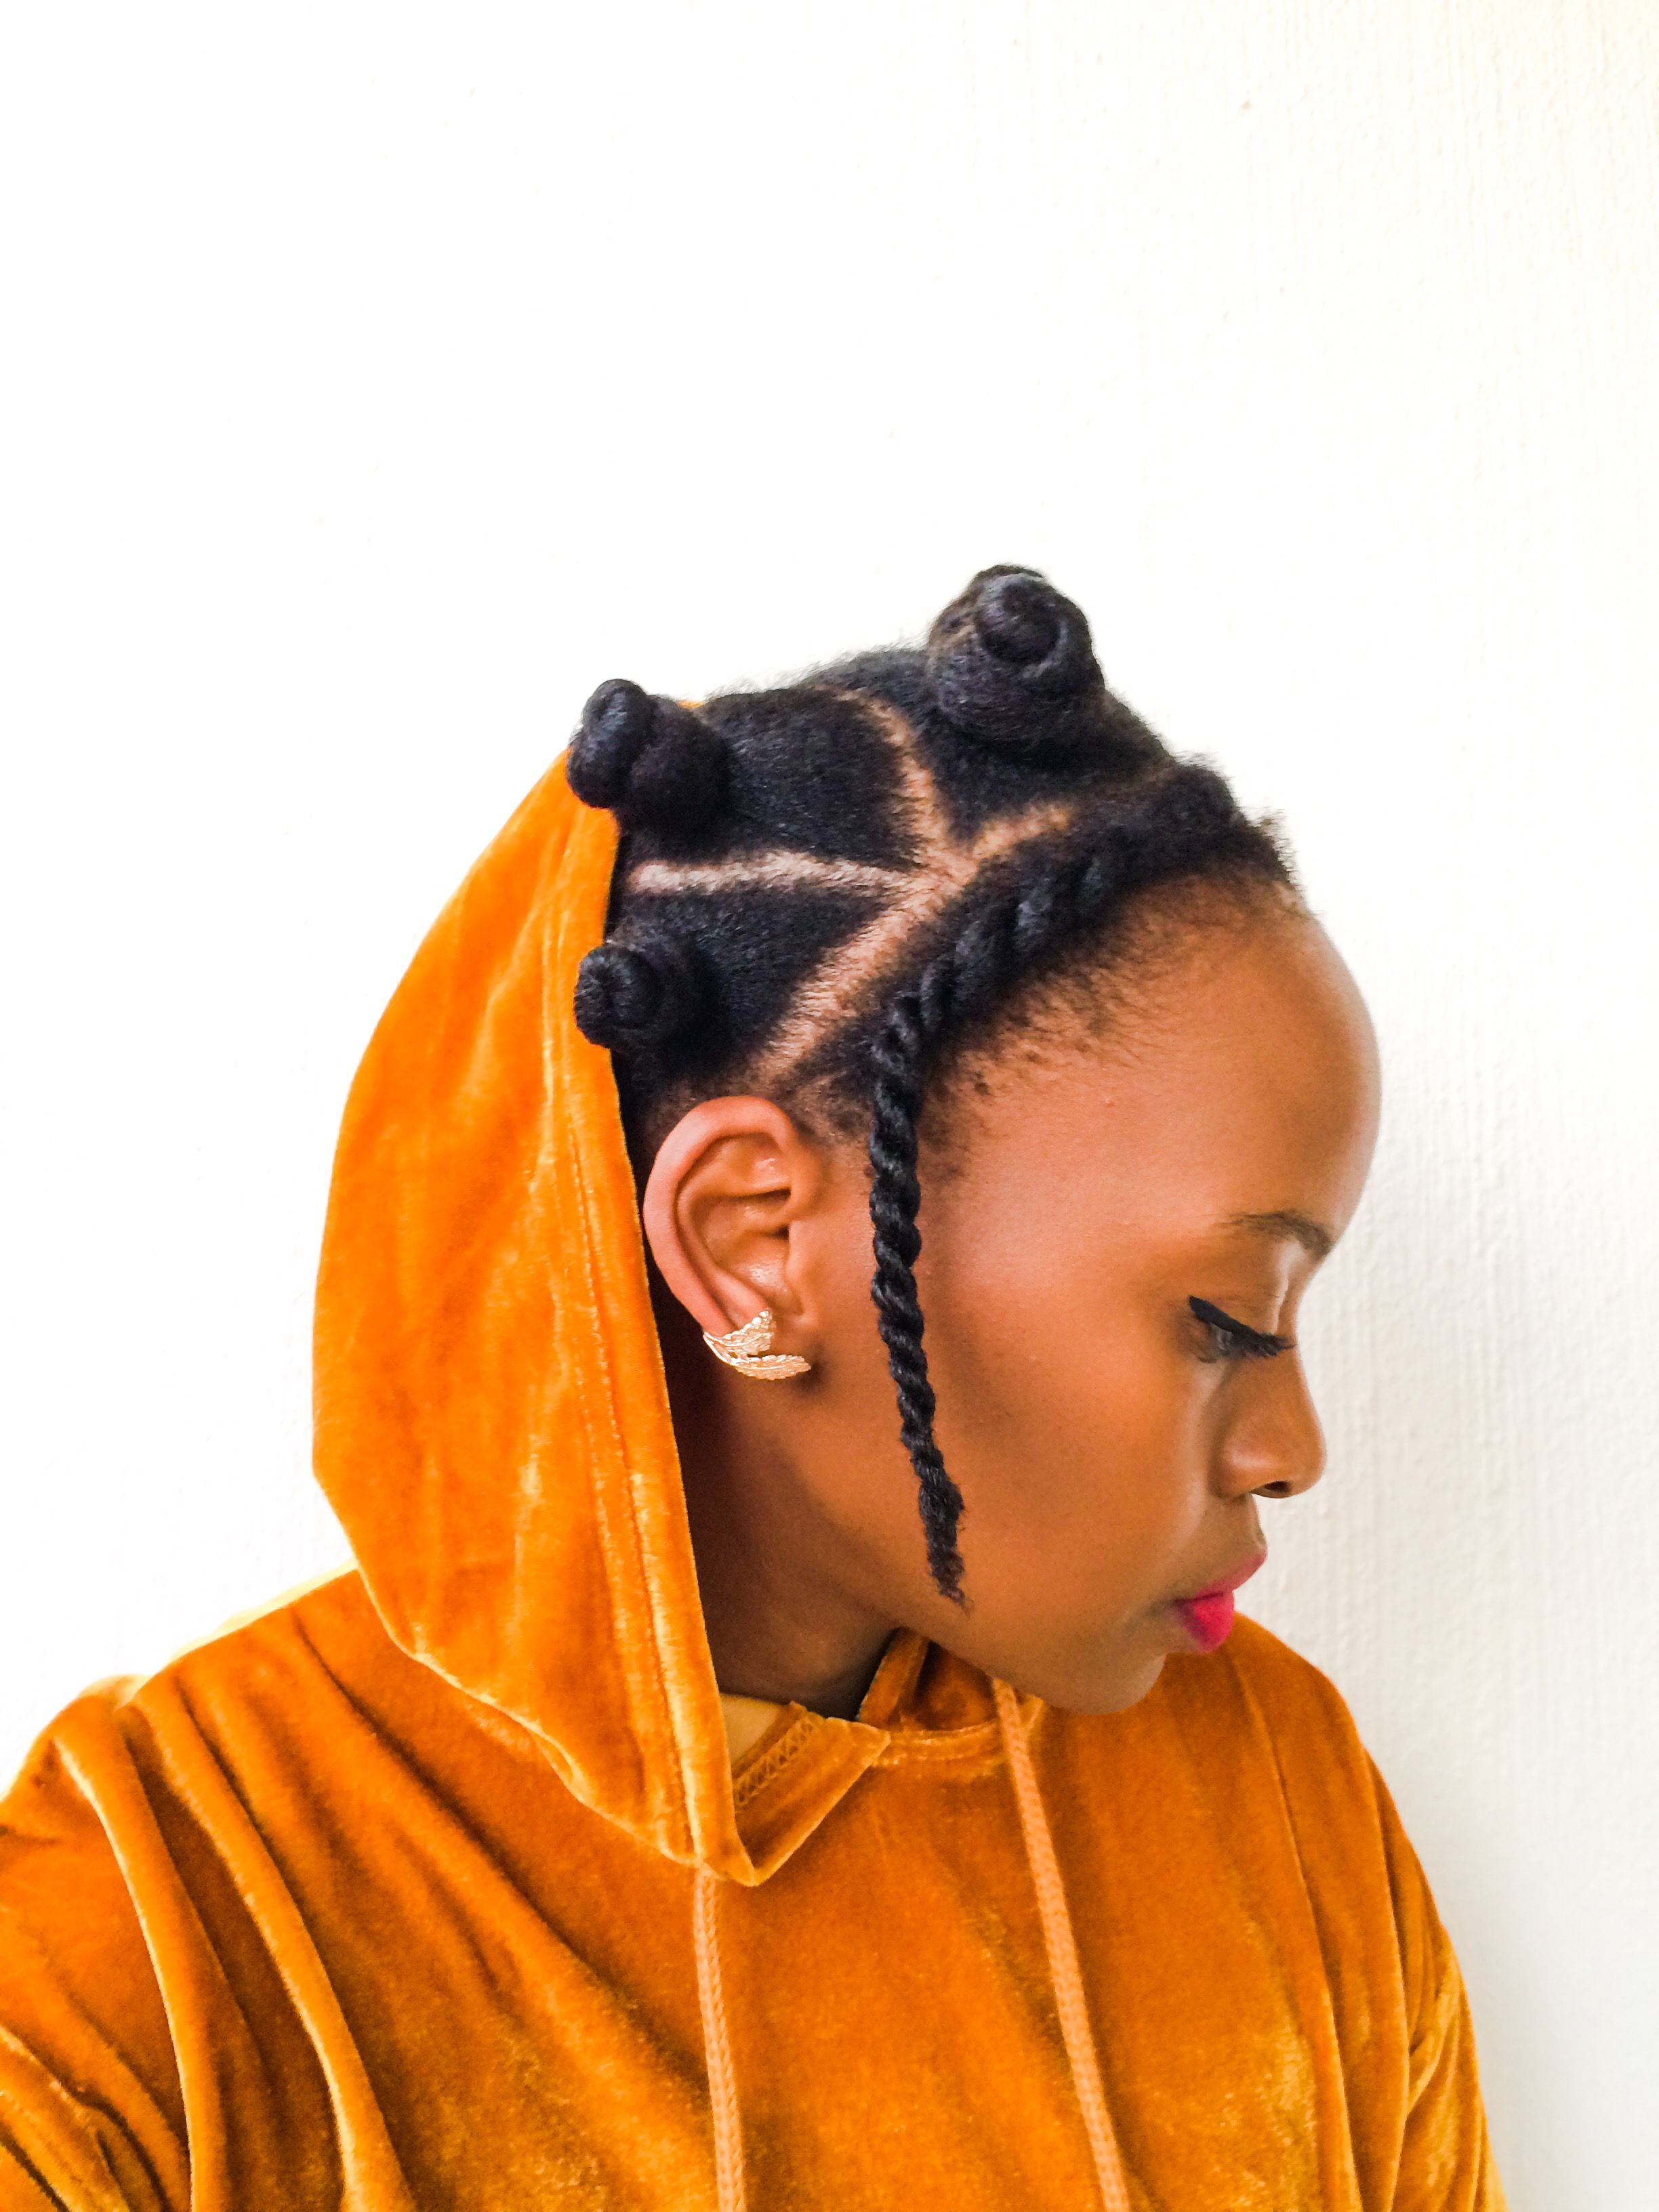 Cheveuxafro 28 Idees De Coiffures Pour Proteger Vos Cheveux Du Froid Coiffuresprotectrices Tressescouchee Cheveuxnatu Idees De Coiffures Coiffure Cheveux